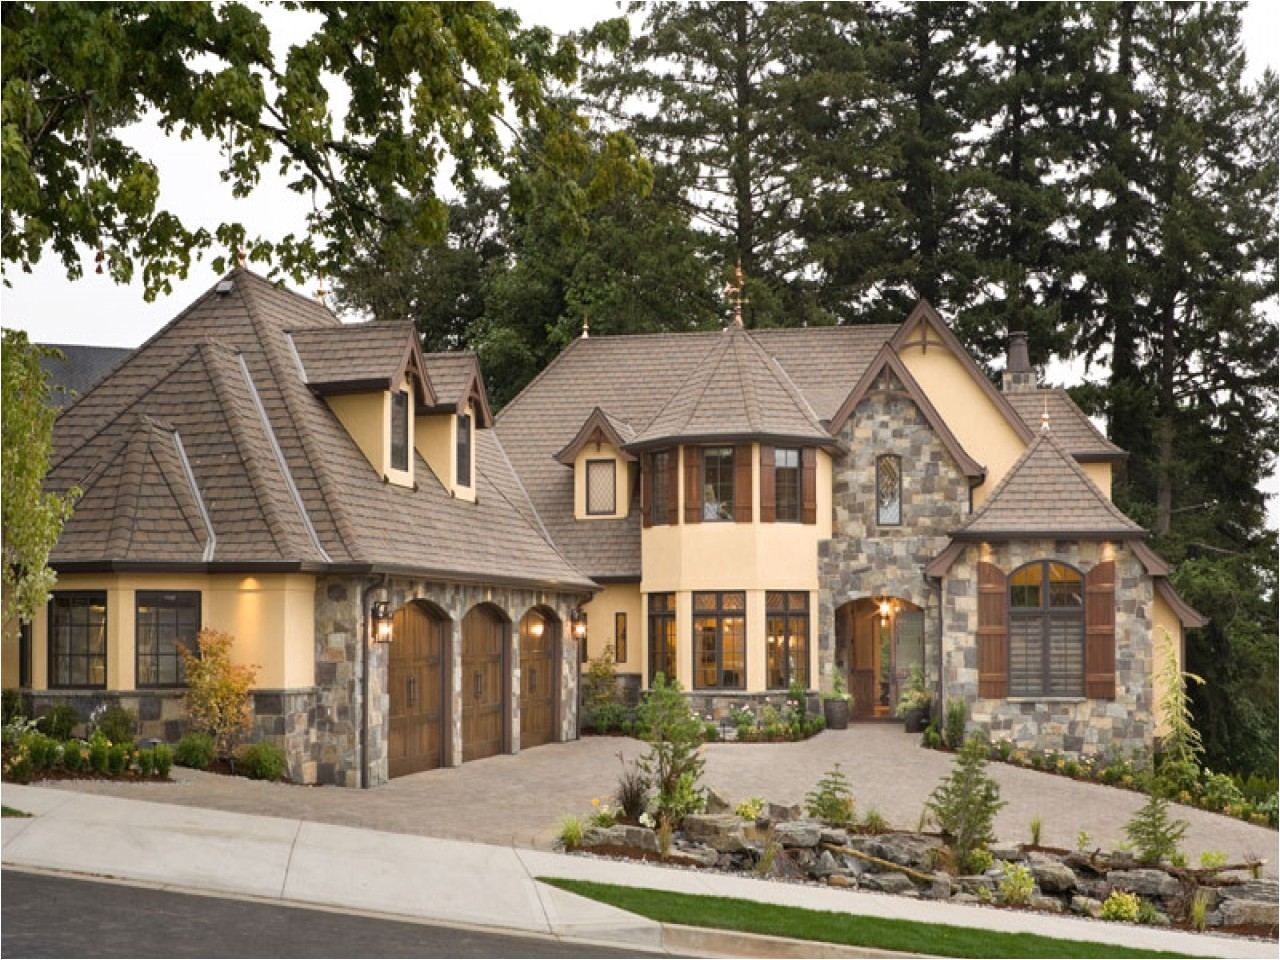 Stone Cottage House Plans | Cottage Homes Plans Stone Cottage House Plans Stone Cottage House